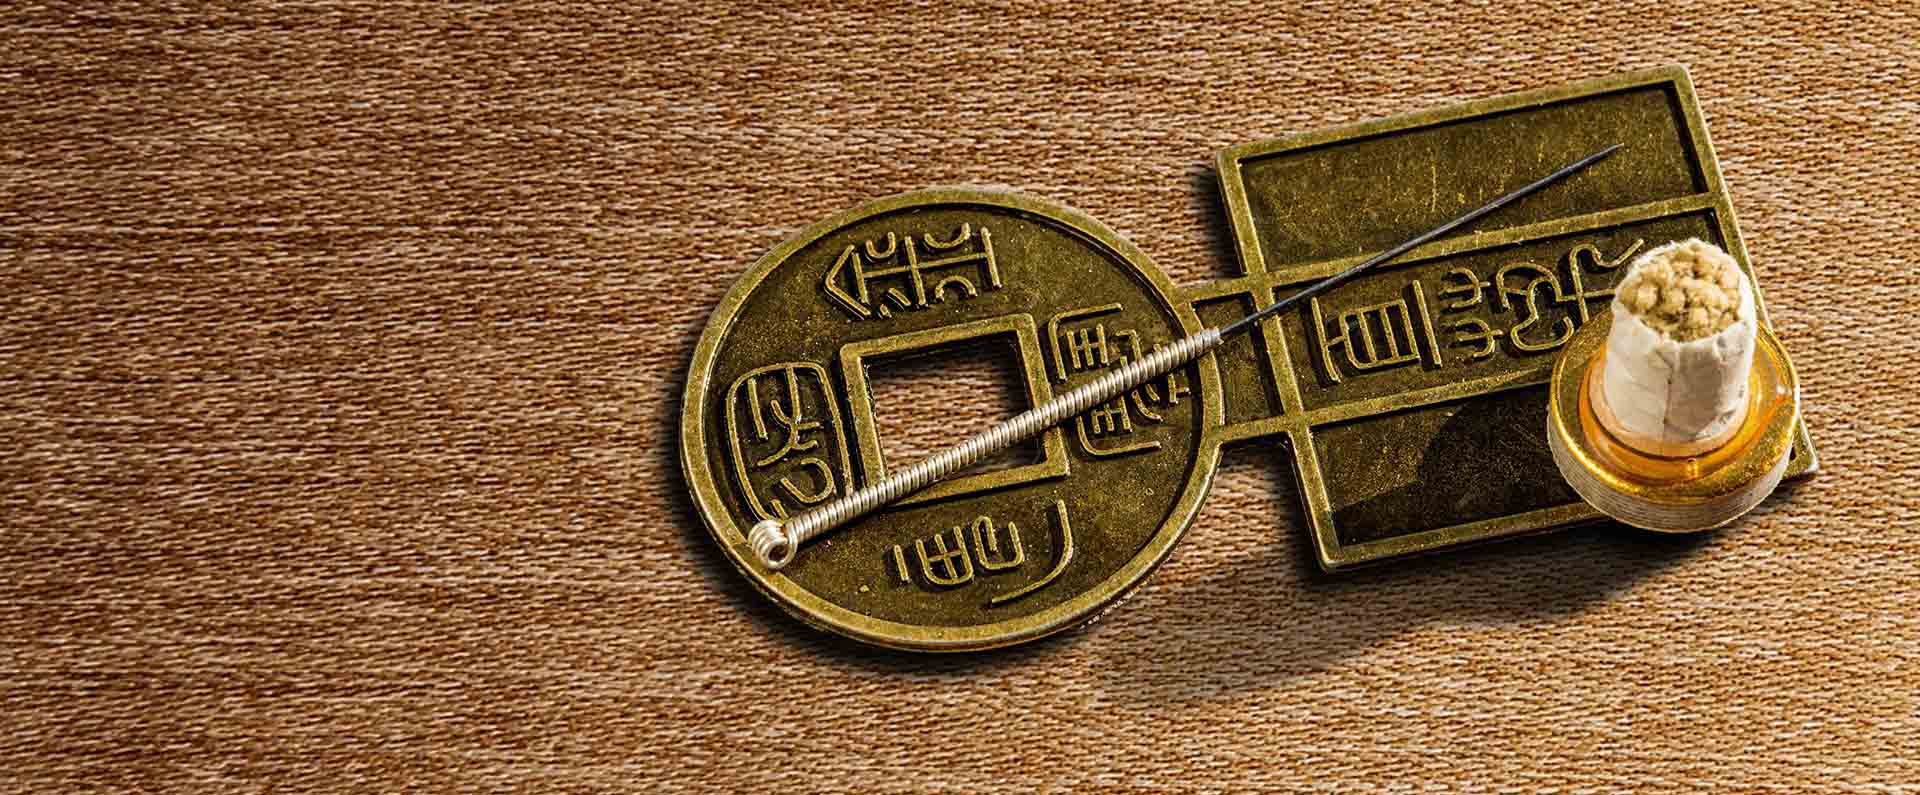 moneta aghi